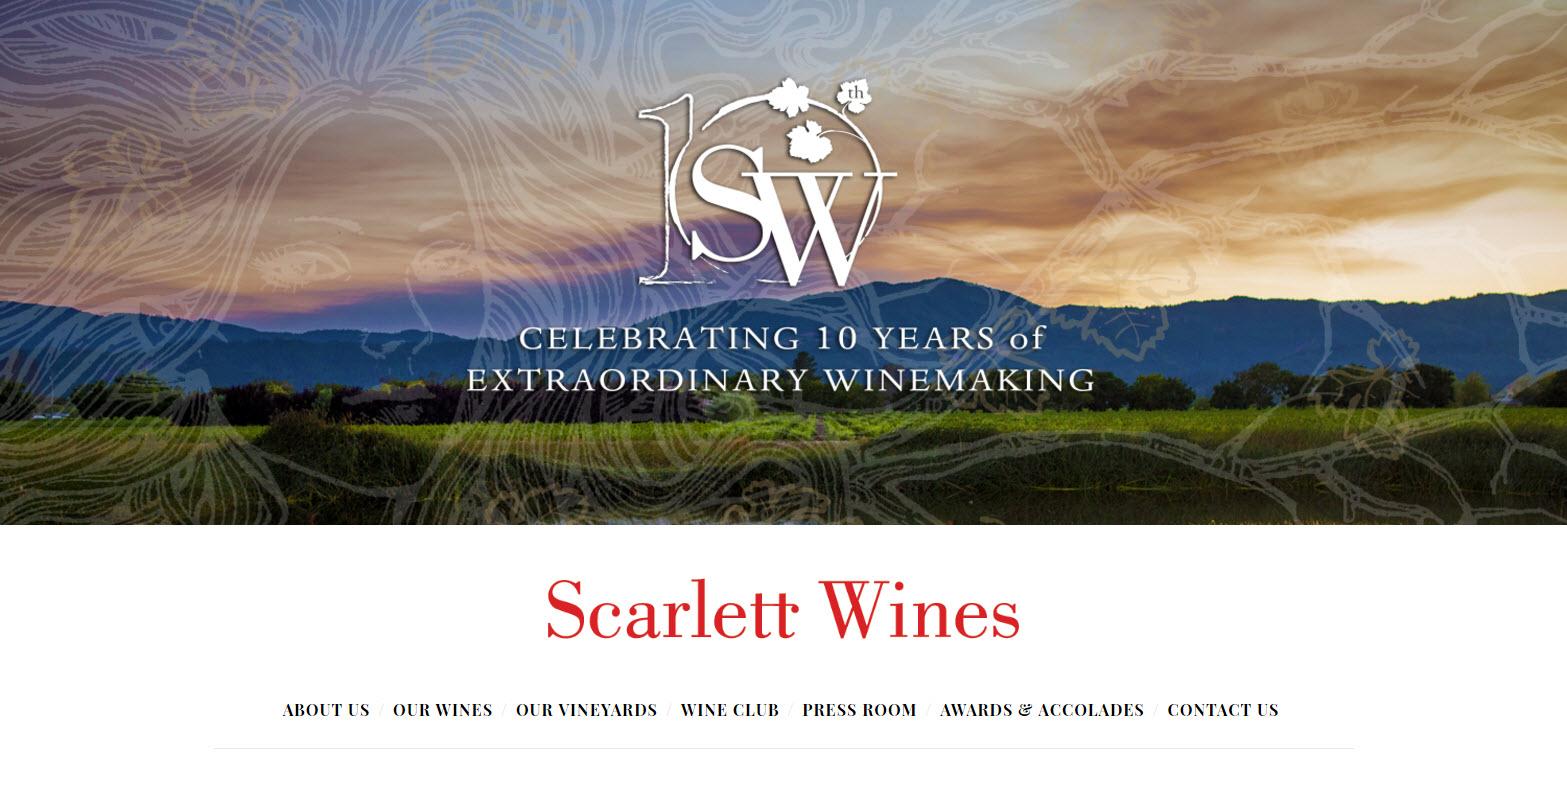 scarlettwines.com